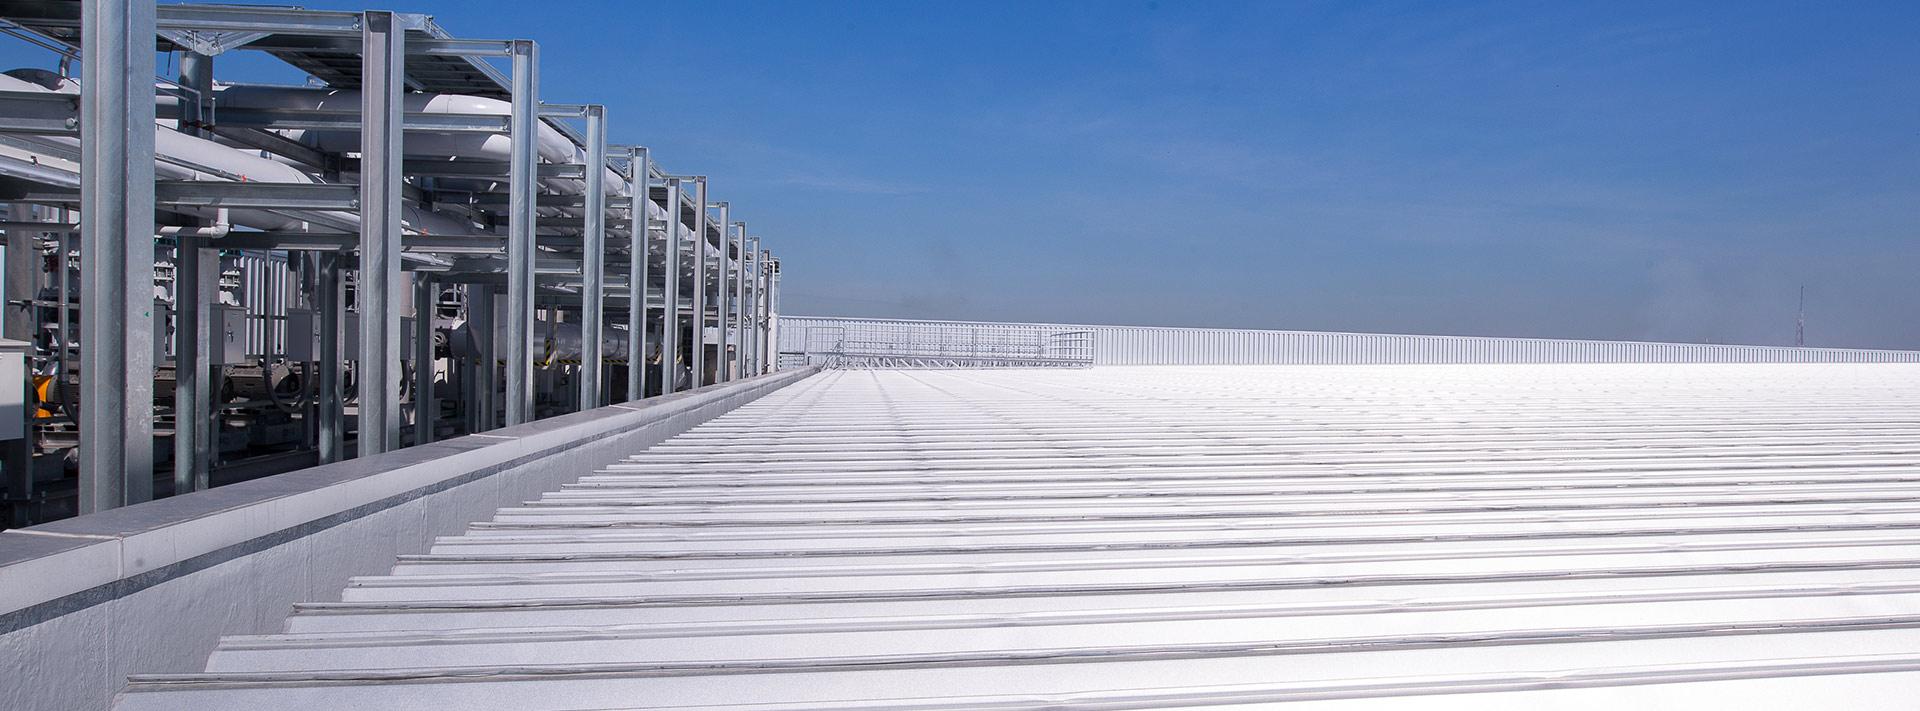 Metal Roof Repair & Maintenance by Roof & Building Service